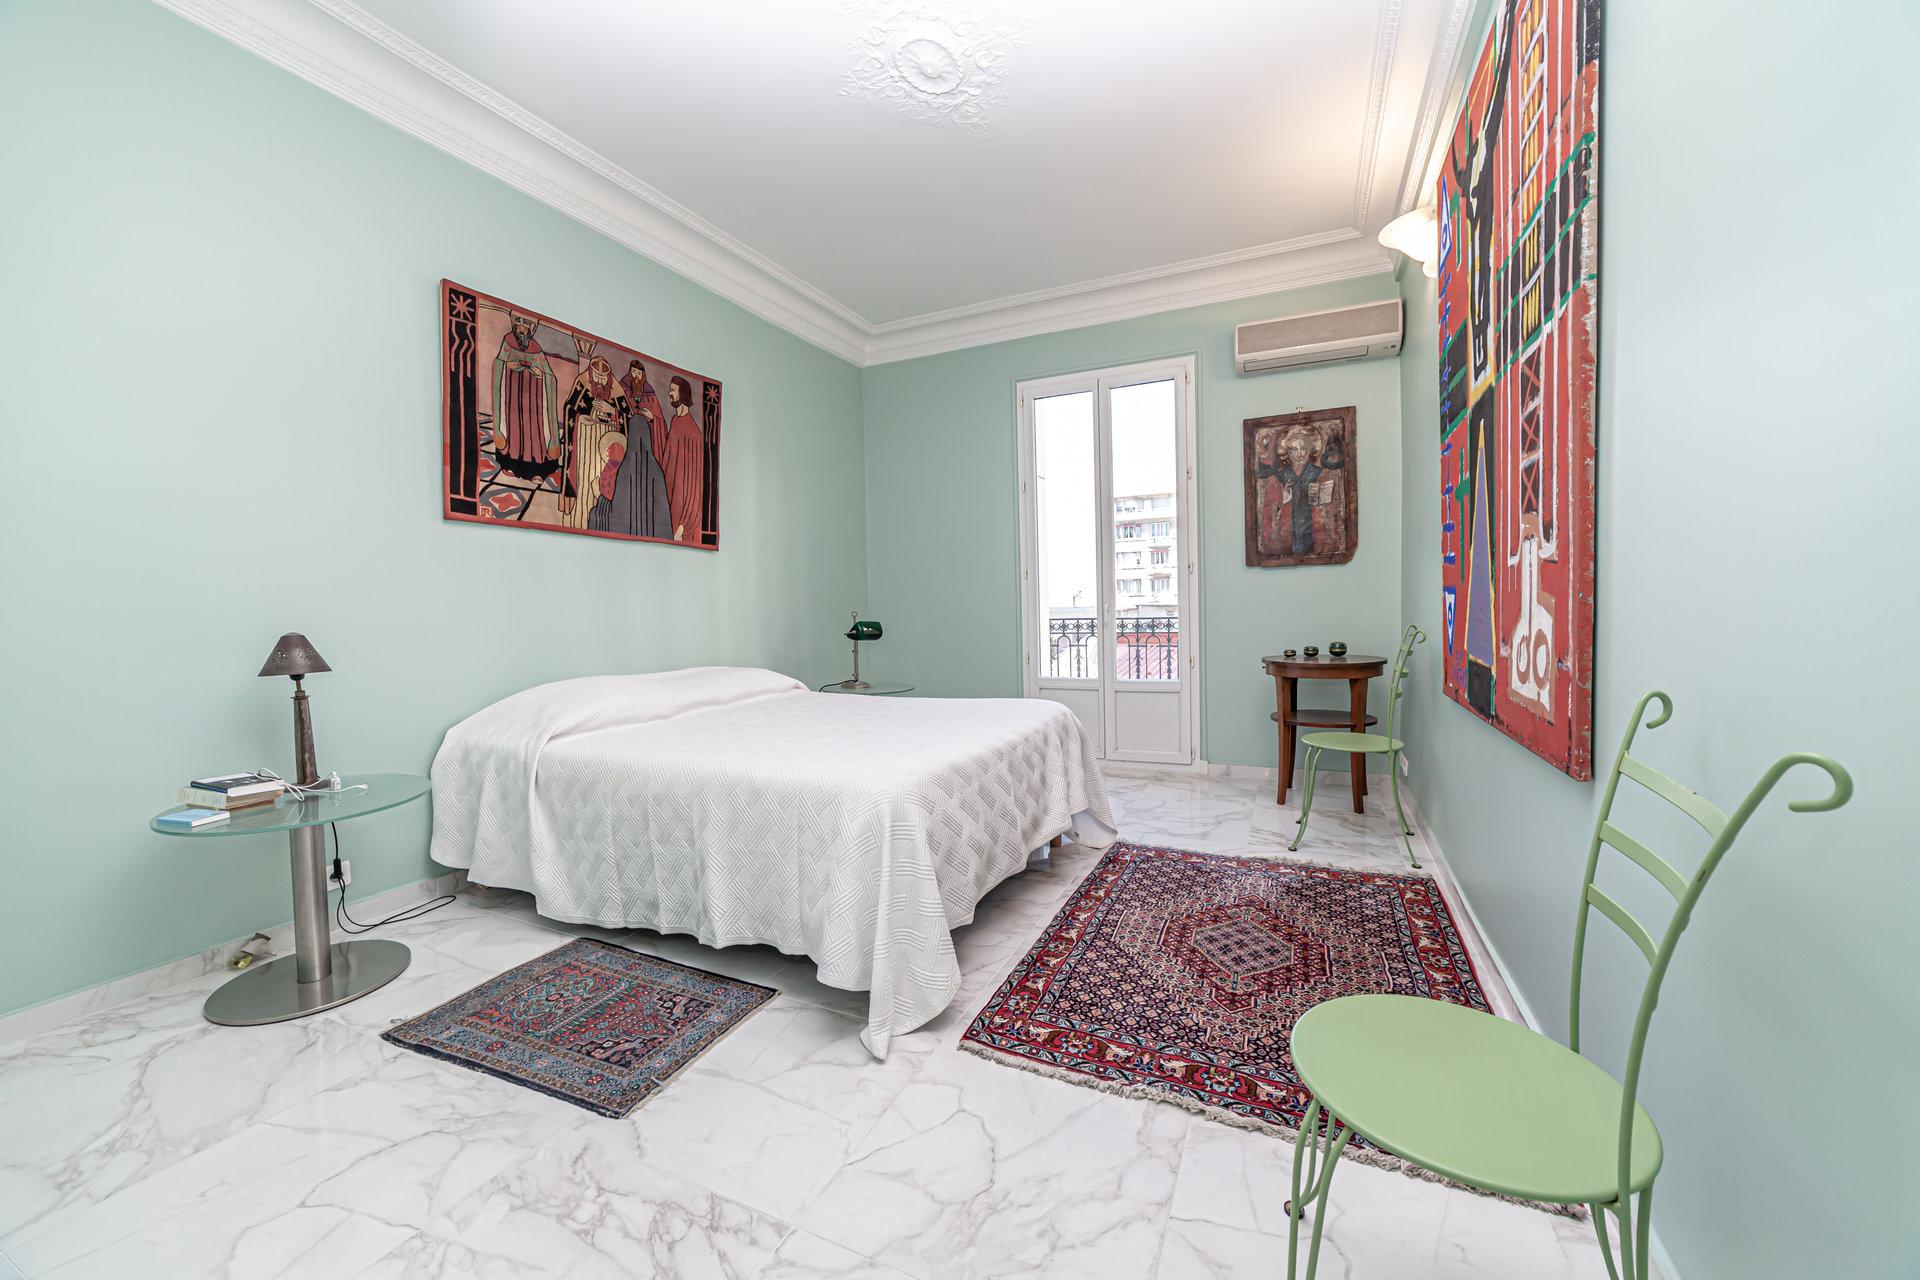 Nice Golden Square/Promenade - 3 bedrooms . 126m2